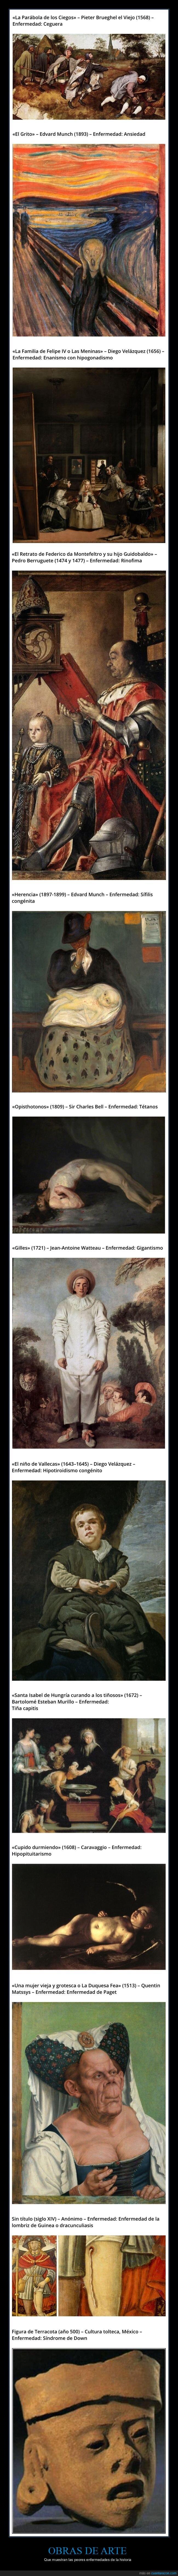 enfermedades,obras de arte